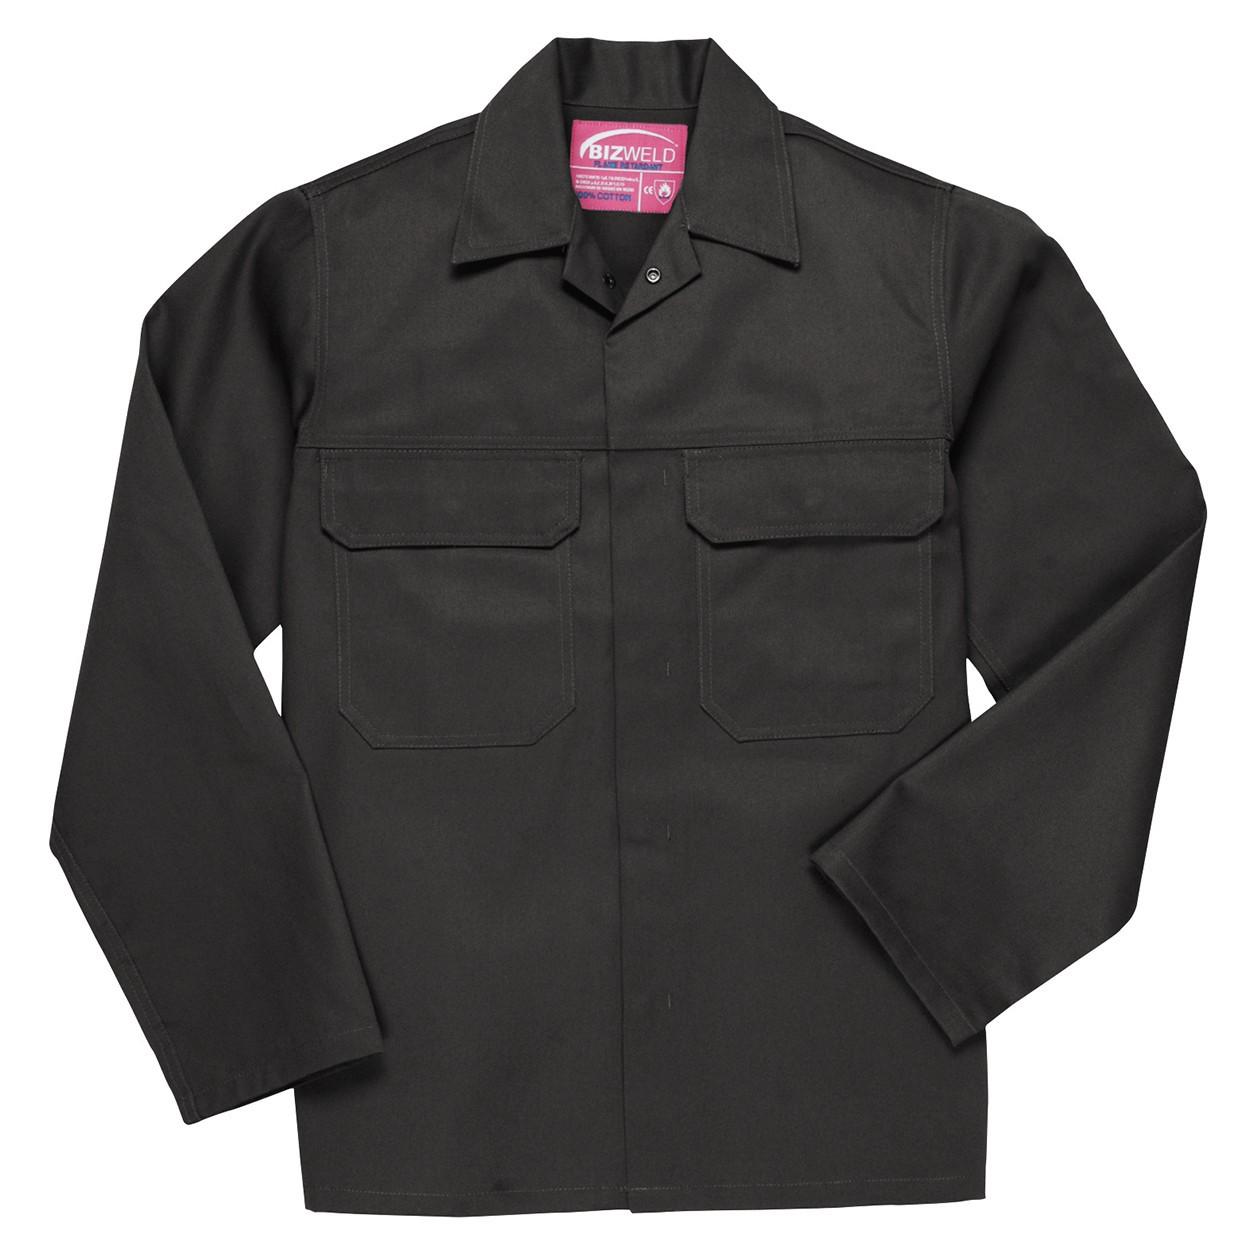 Portwest BIZ2 Bizweld flame resistant jacket size XL